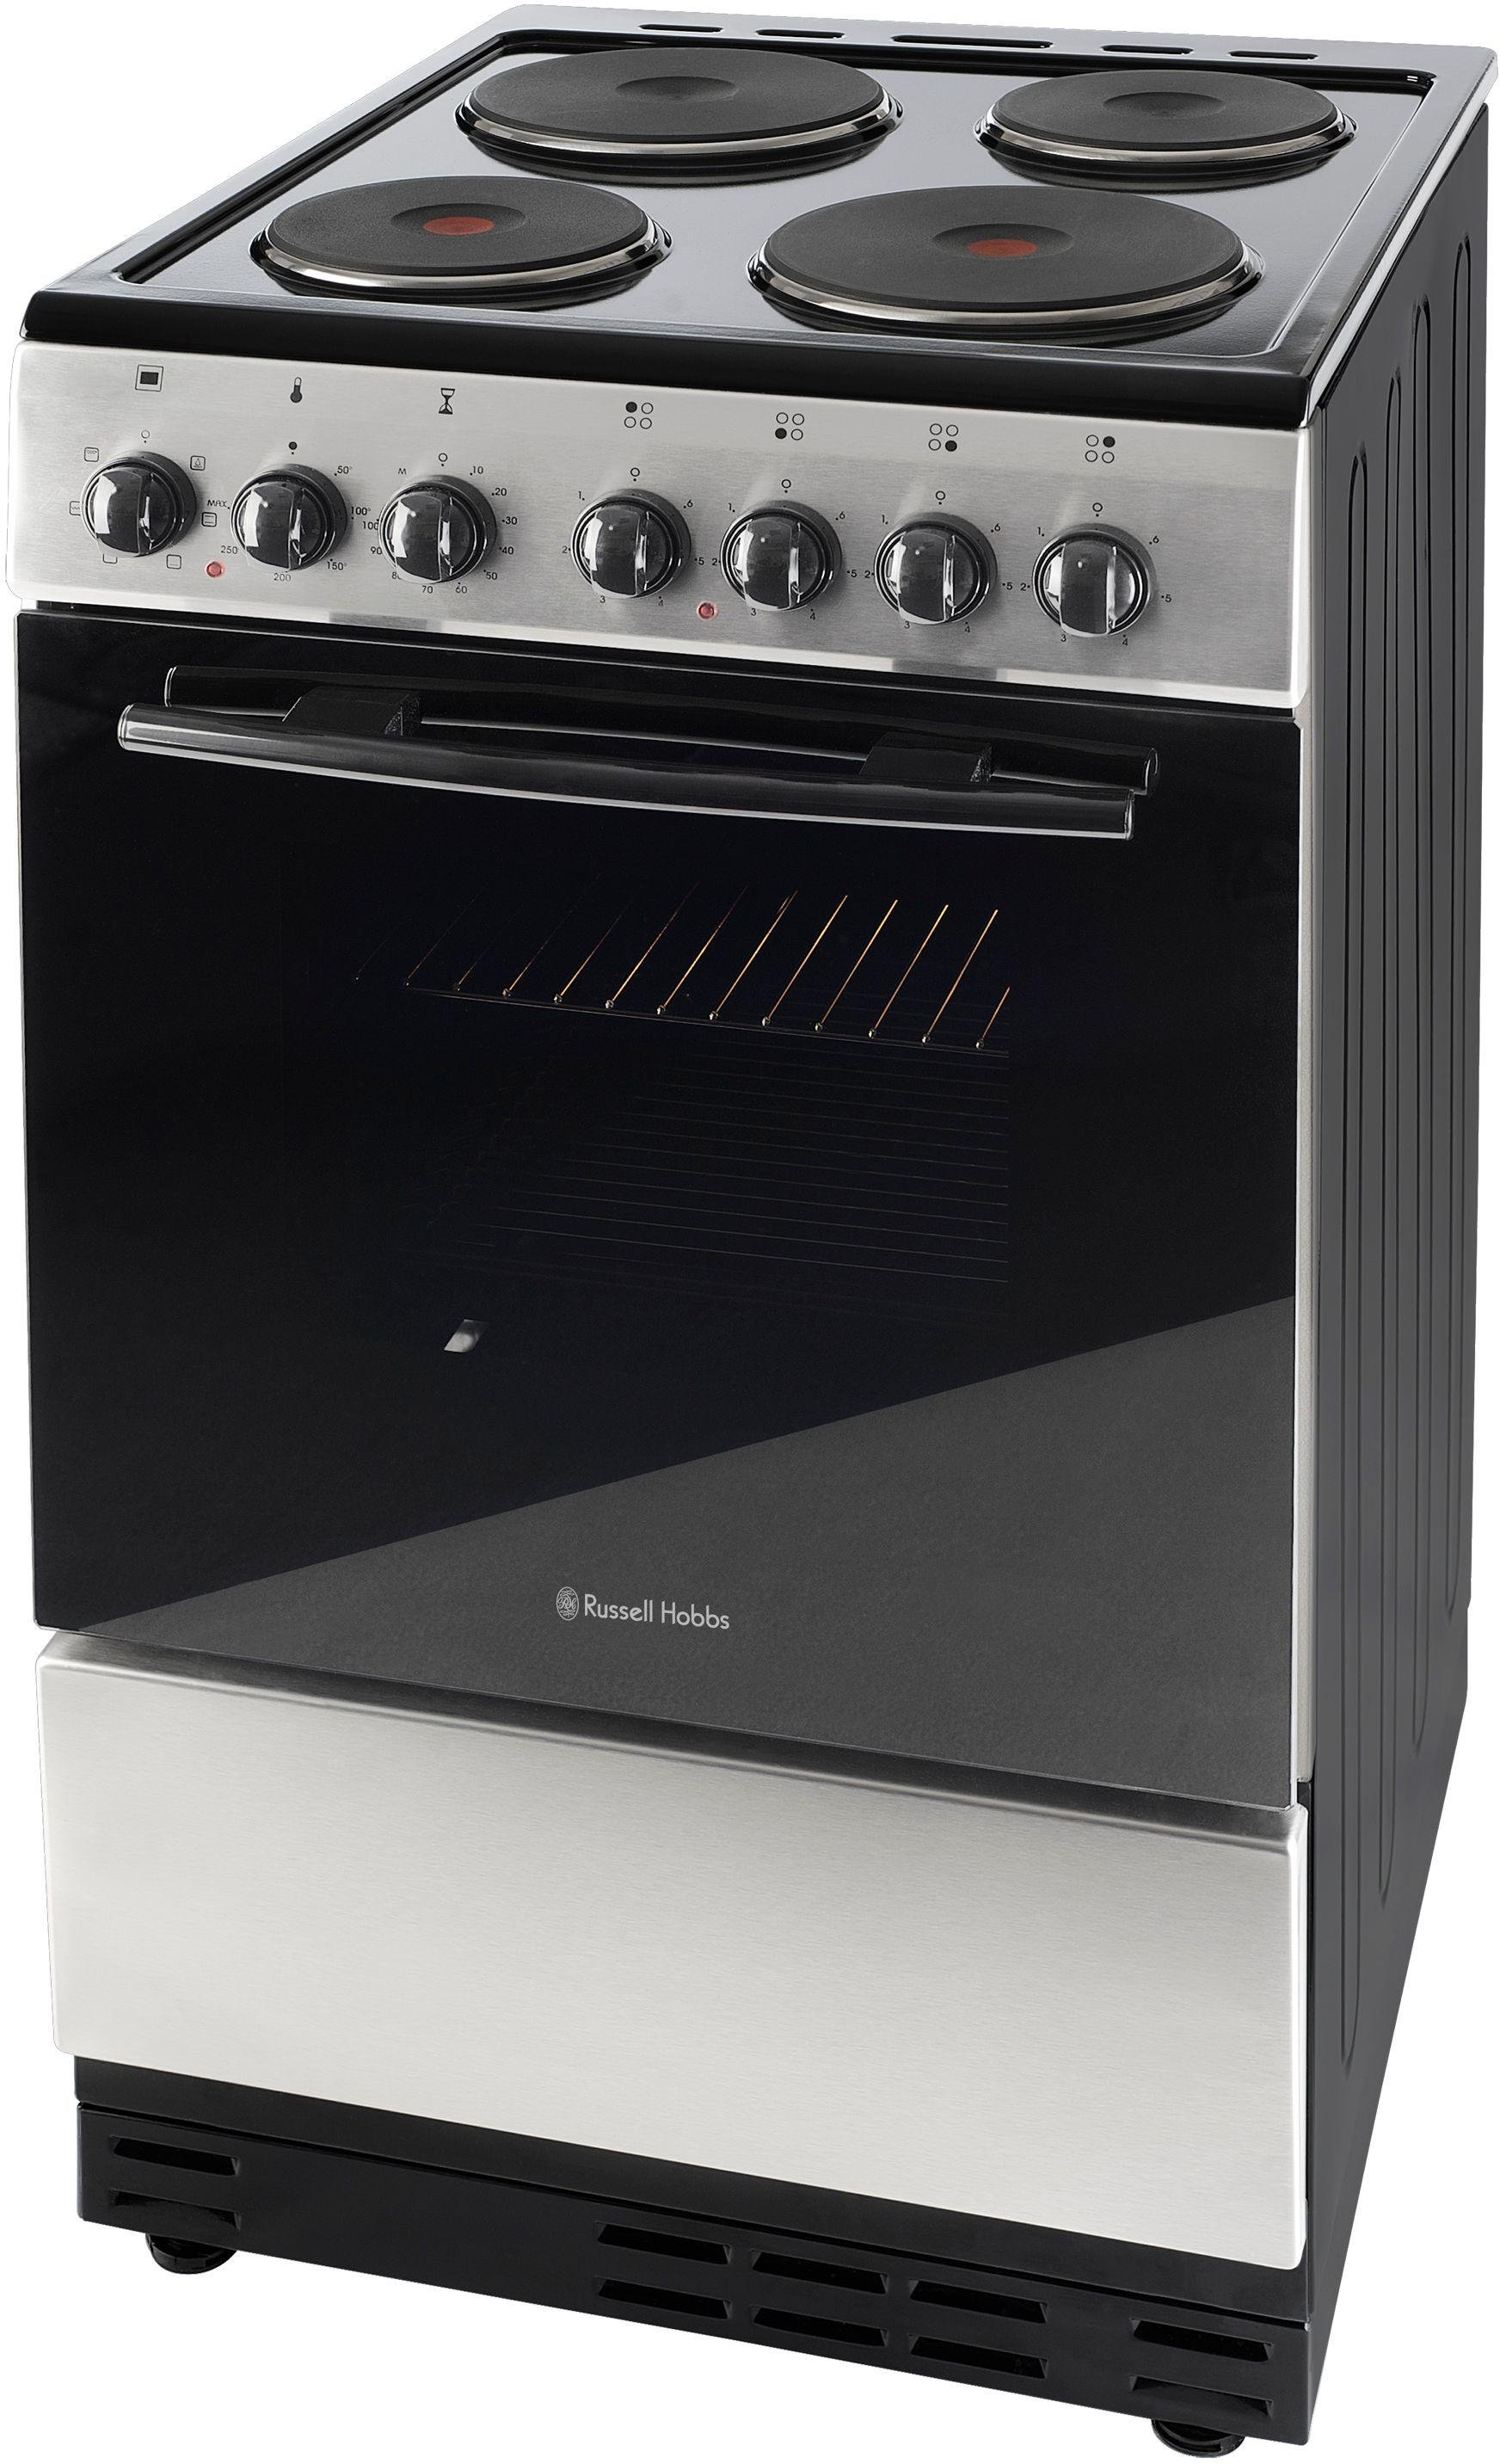 russell hobbs rhec1sw single electric cooker s steel. Black Bedroom Furniture Sets. Home Design Ideas